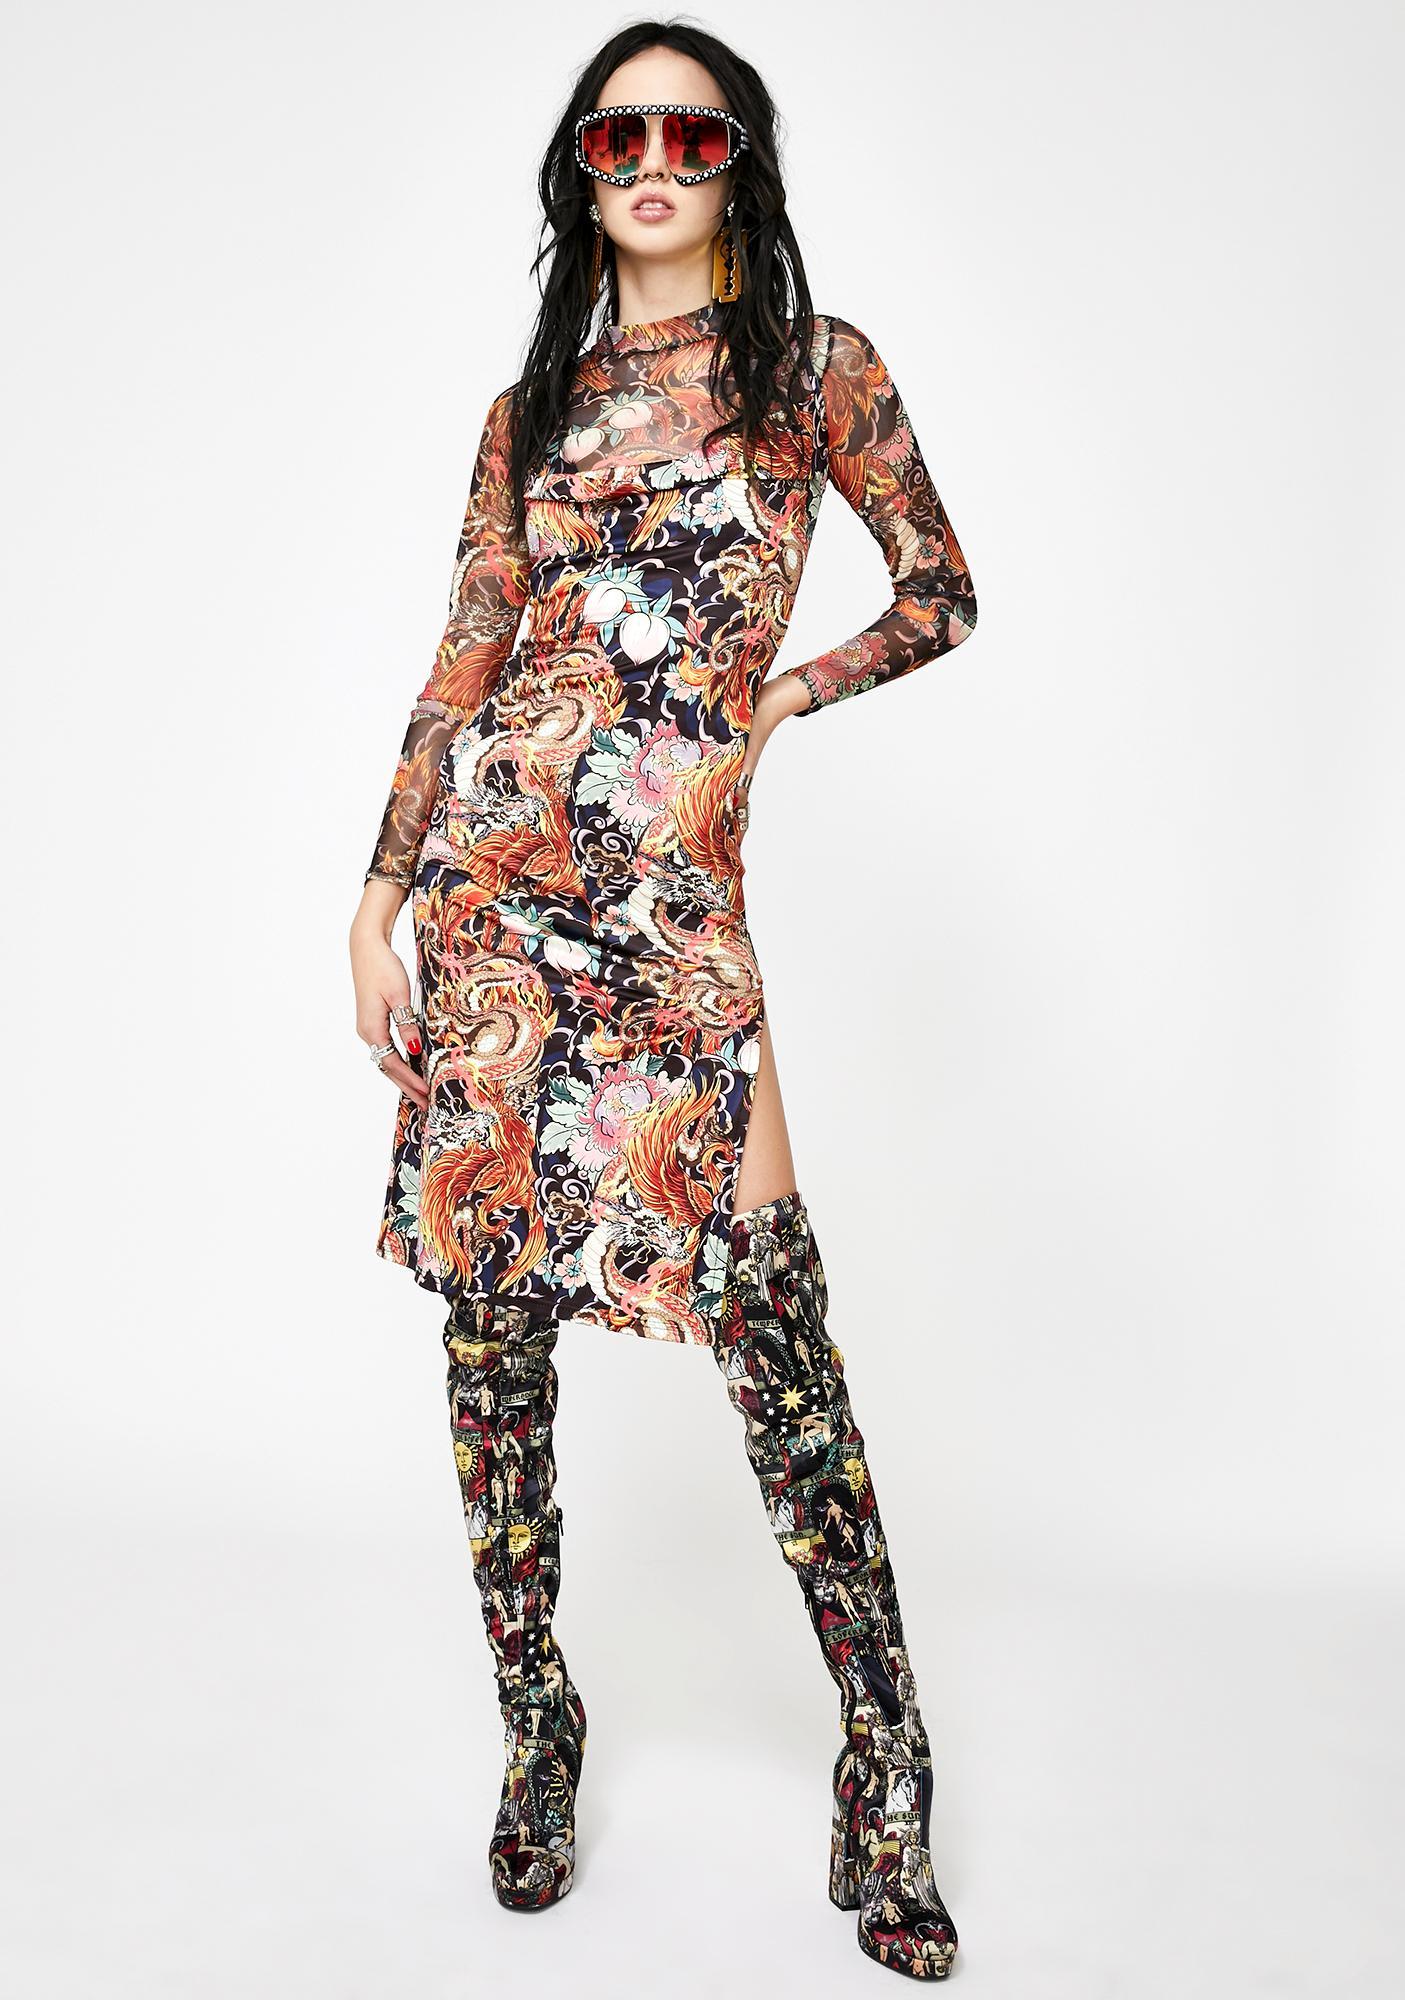 NEW GIRL ORDER Phoenix Dragon Print Slip Dress